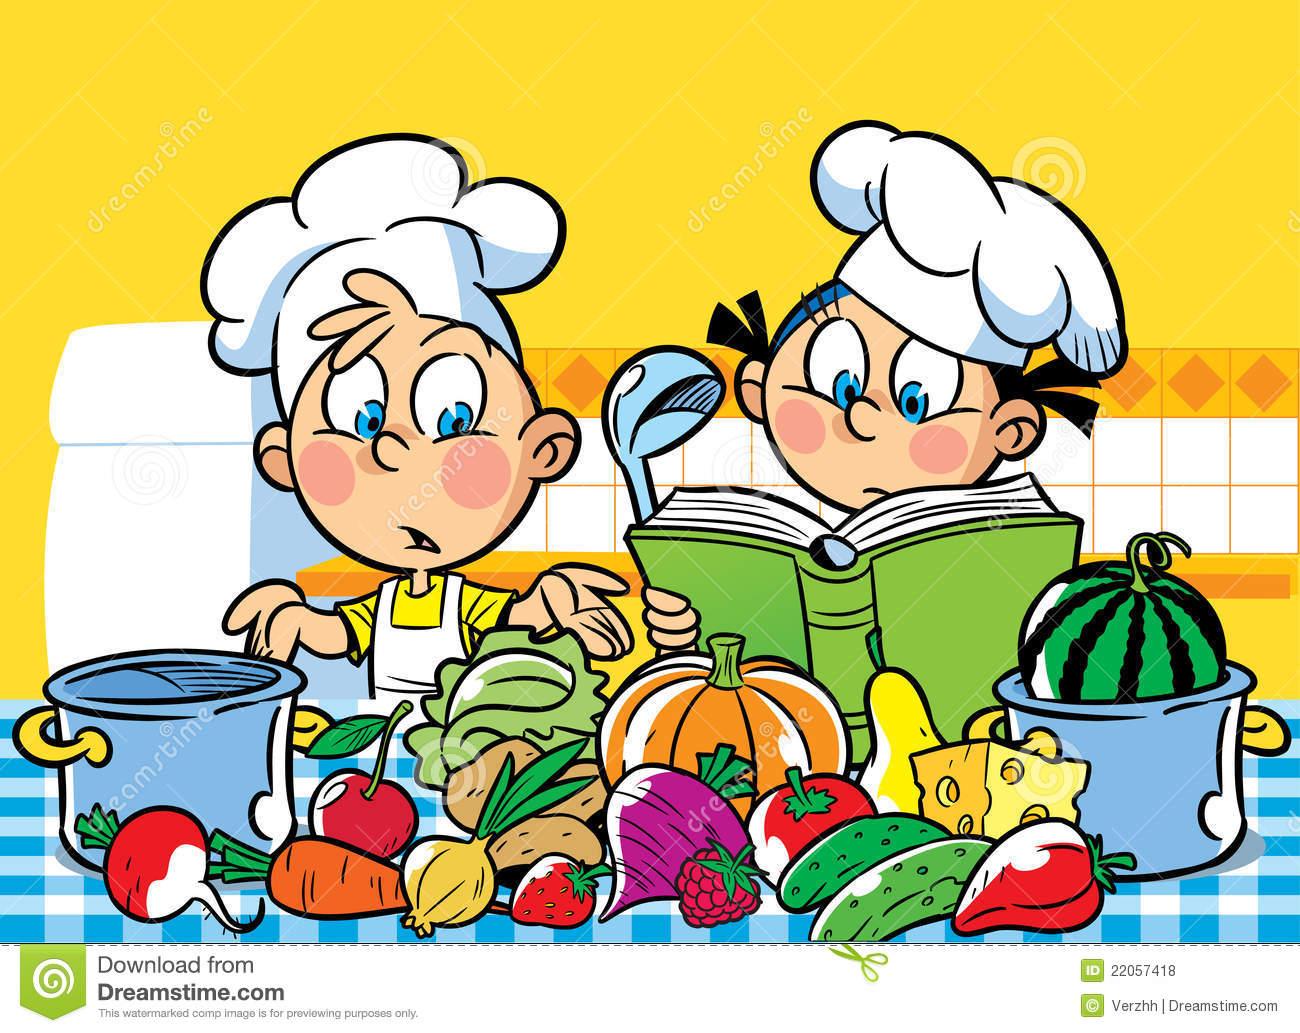 Kochen kinder clipart jpg free library Kinder Kochen Stock Illustrationen, Vektors, & Klipart – (1,785 ... jpg free library